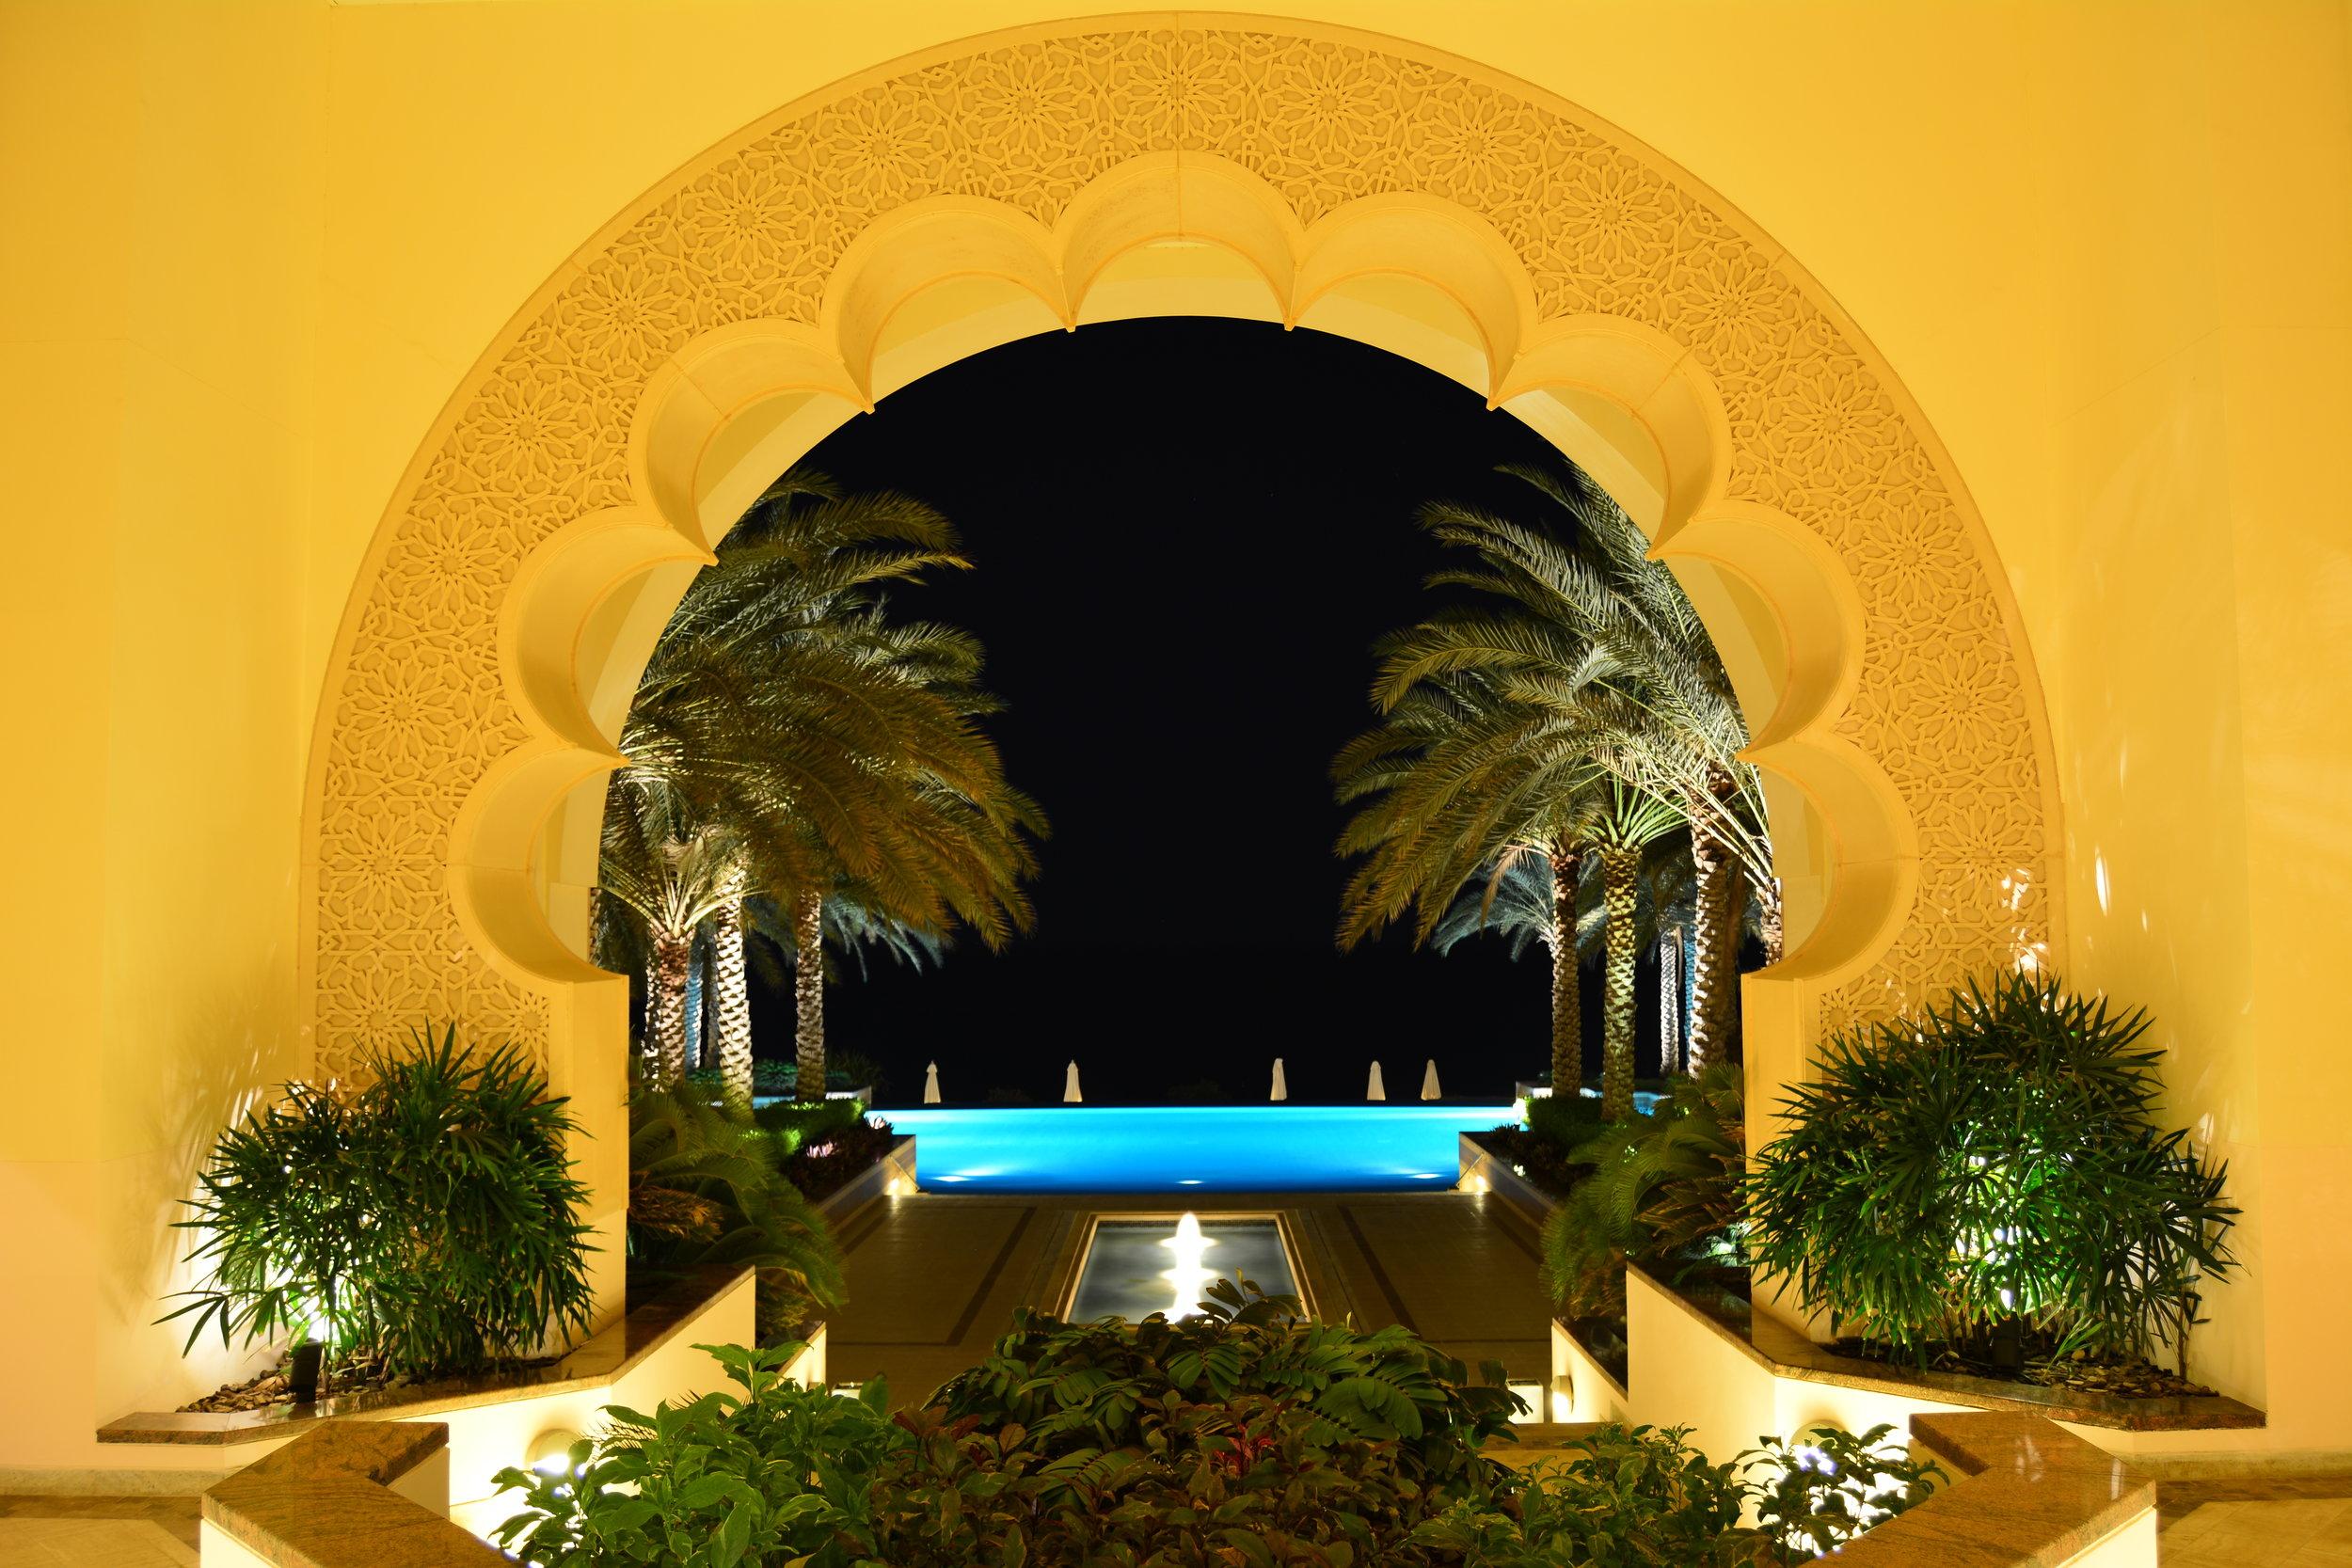 Al Husn - Courtyard at Night (Shangri-La Muscat)